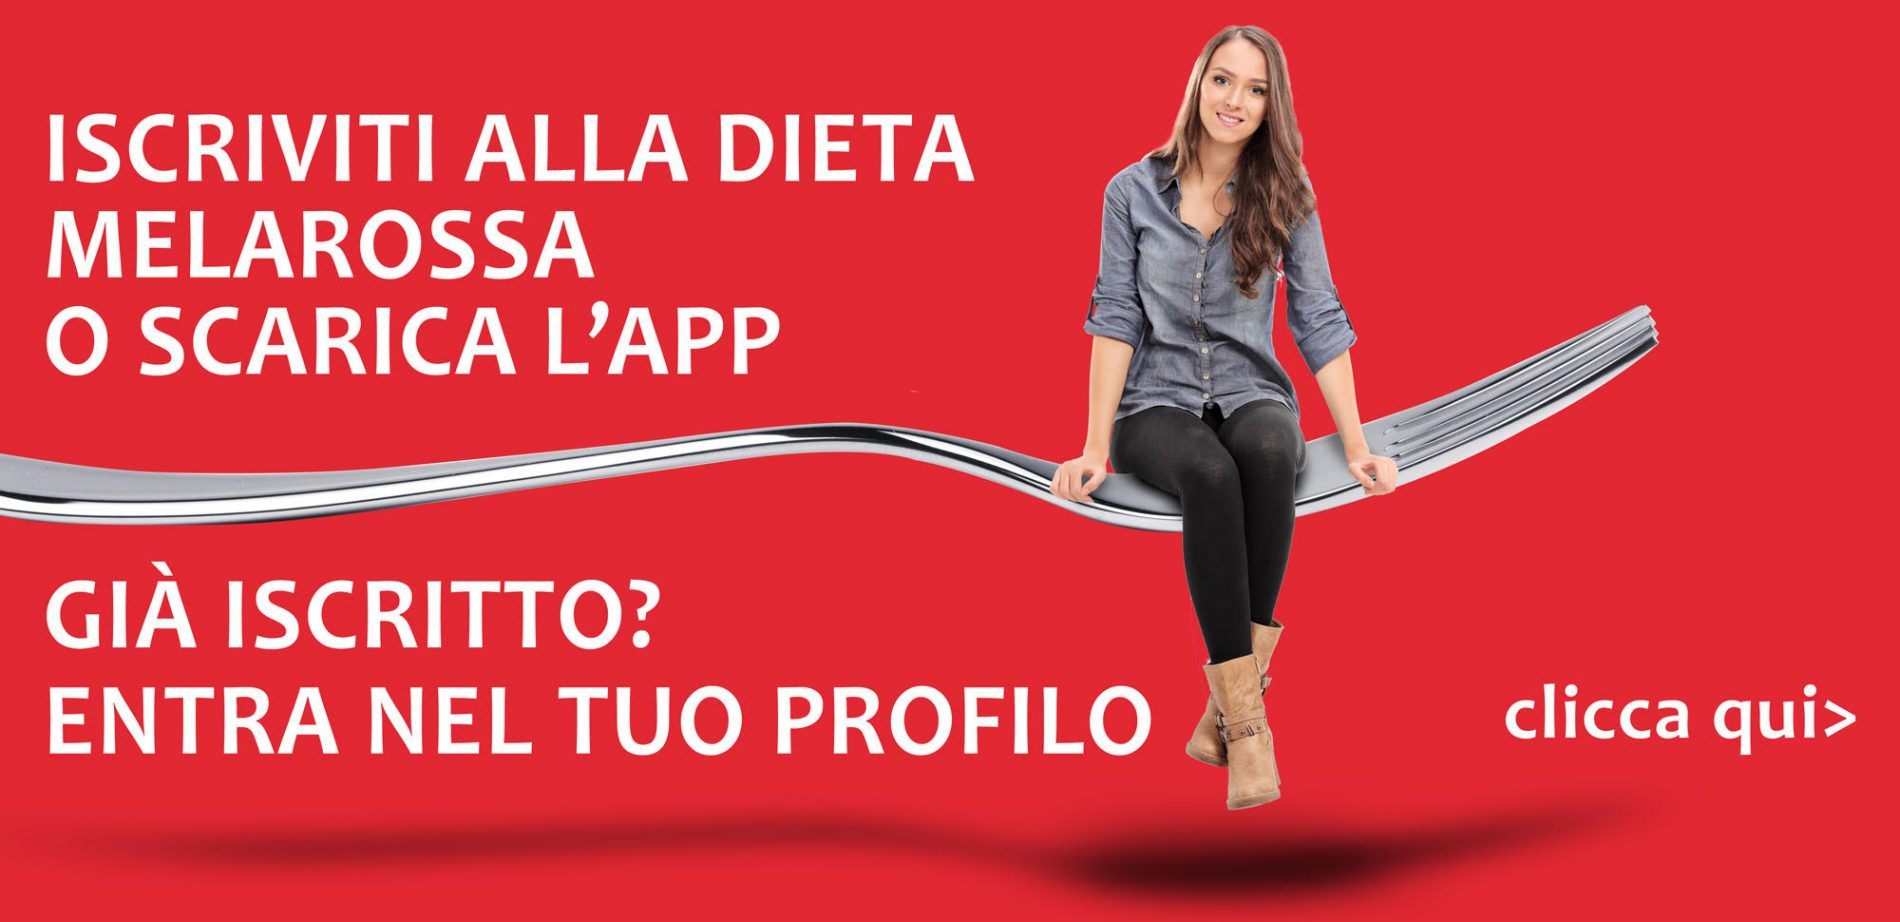 banner iscrizione dieta Melarossa